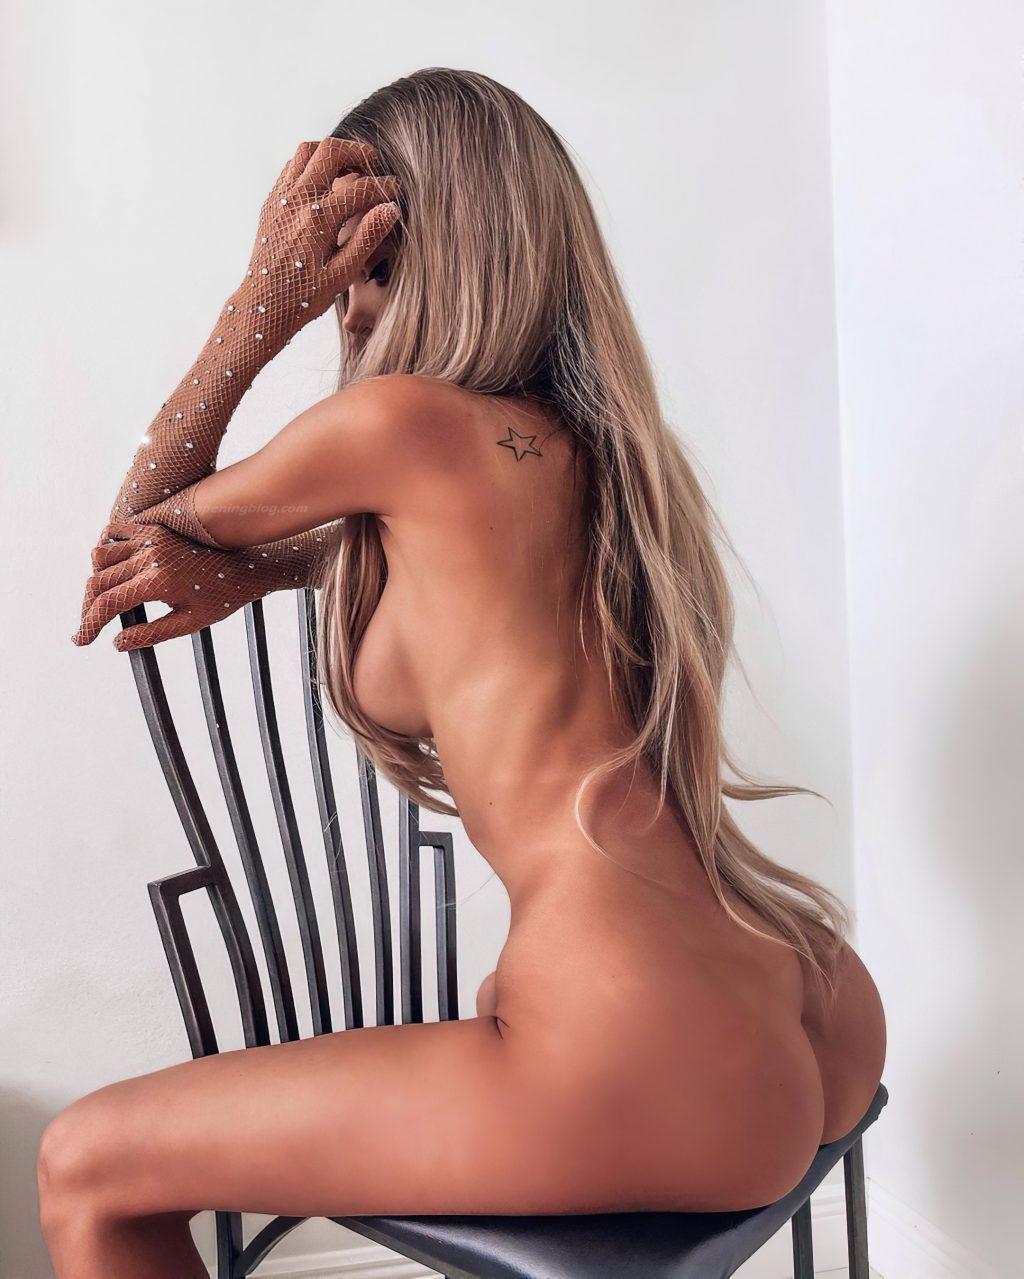 Лили Ермак голая — #TheFappening